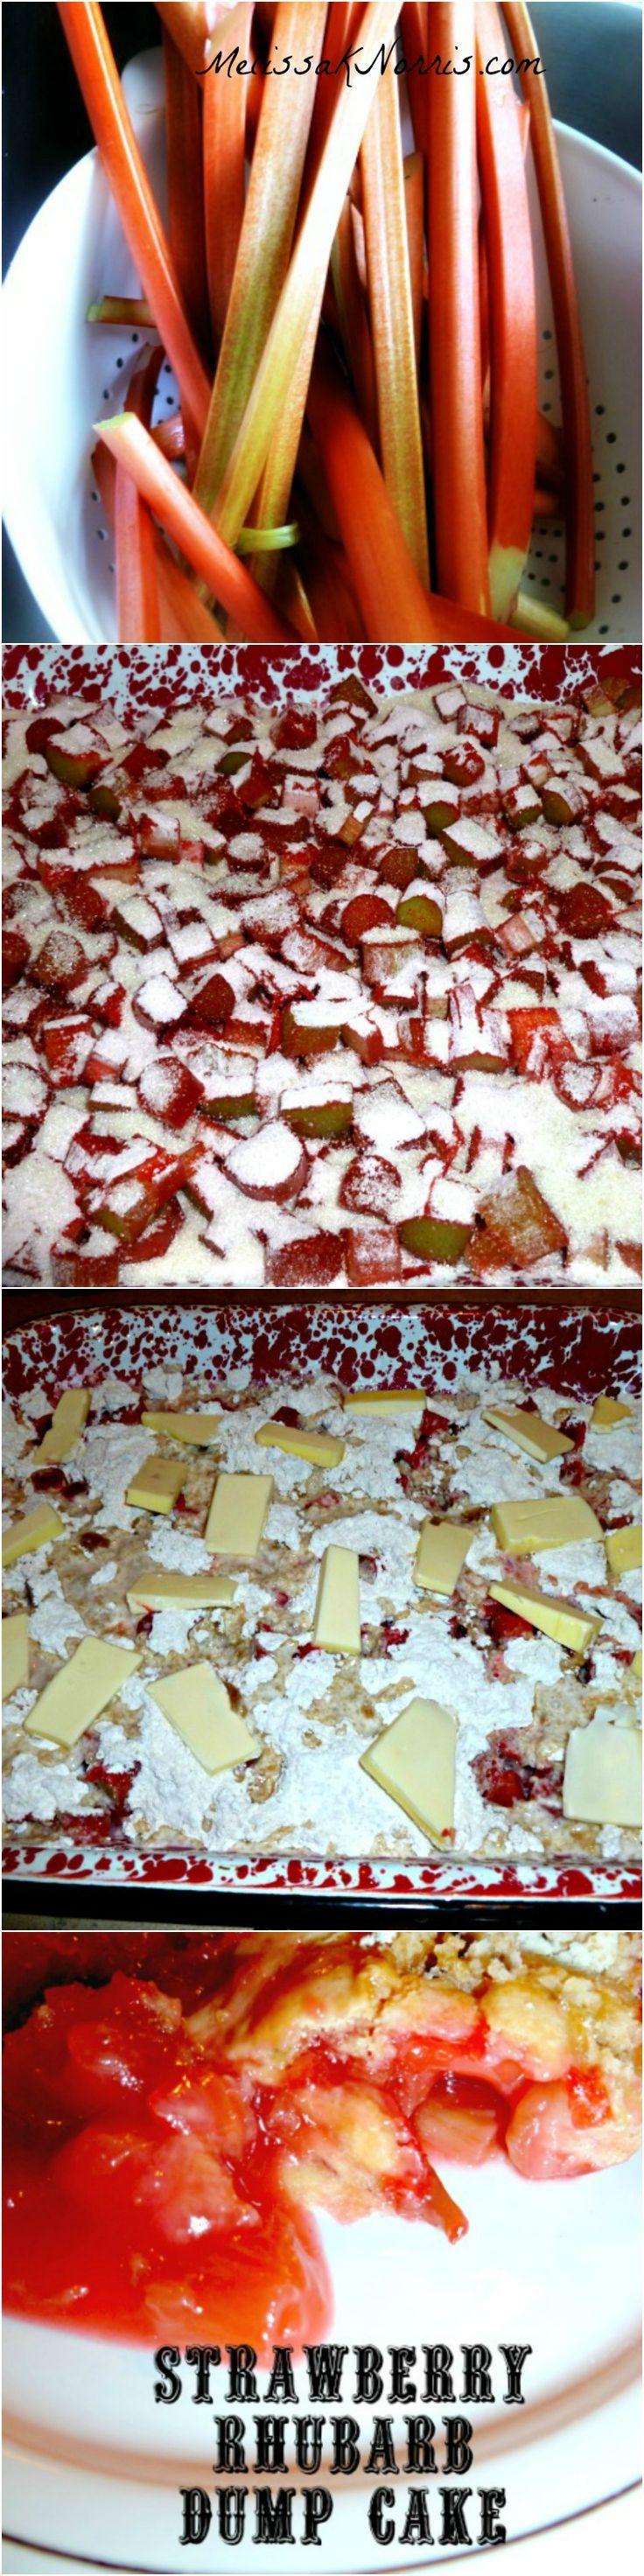 Strawberry rhubarb recipes cake